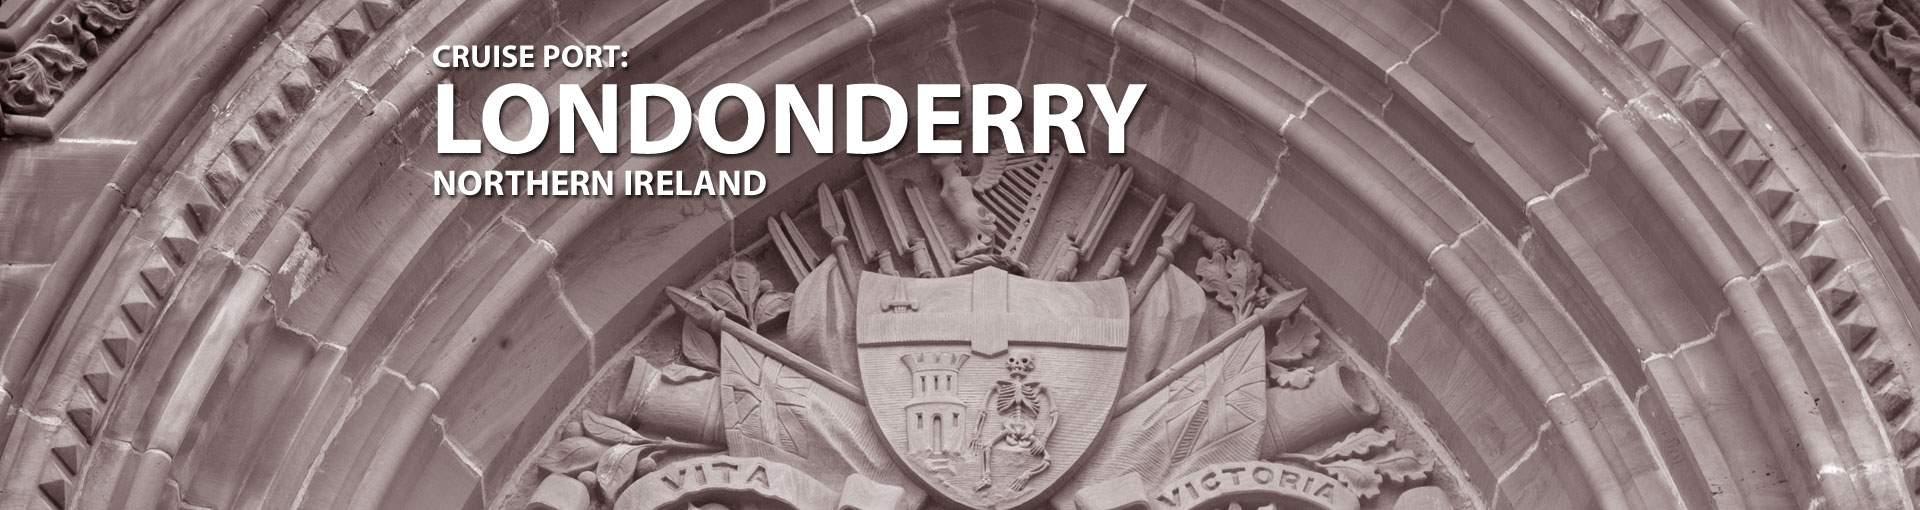 Cruises to Londonderry, Northern Ireland